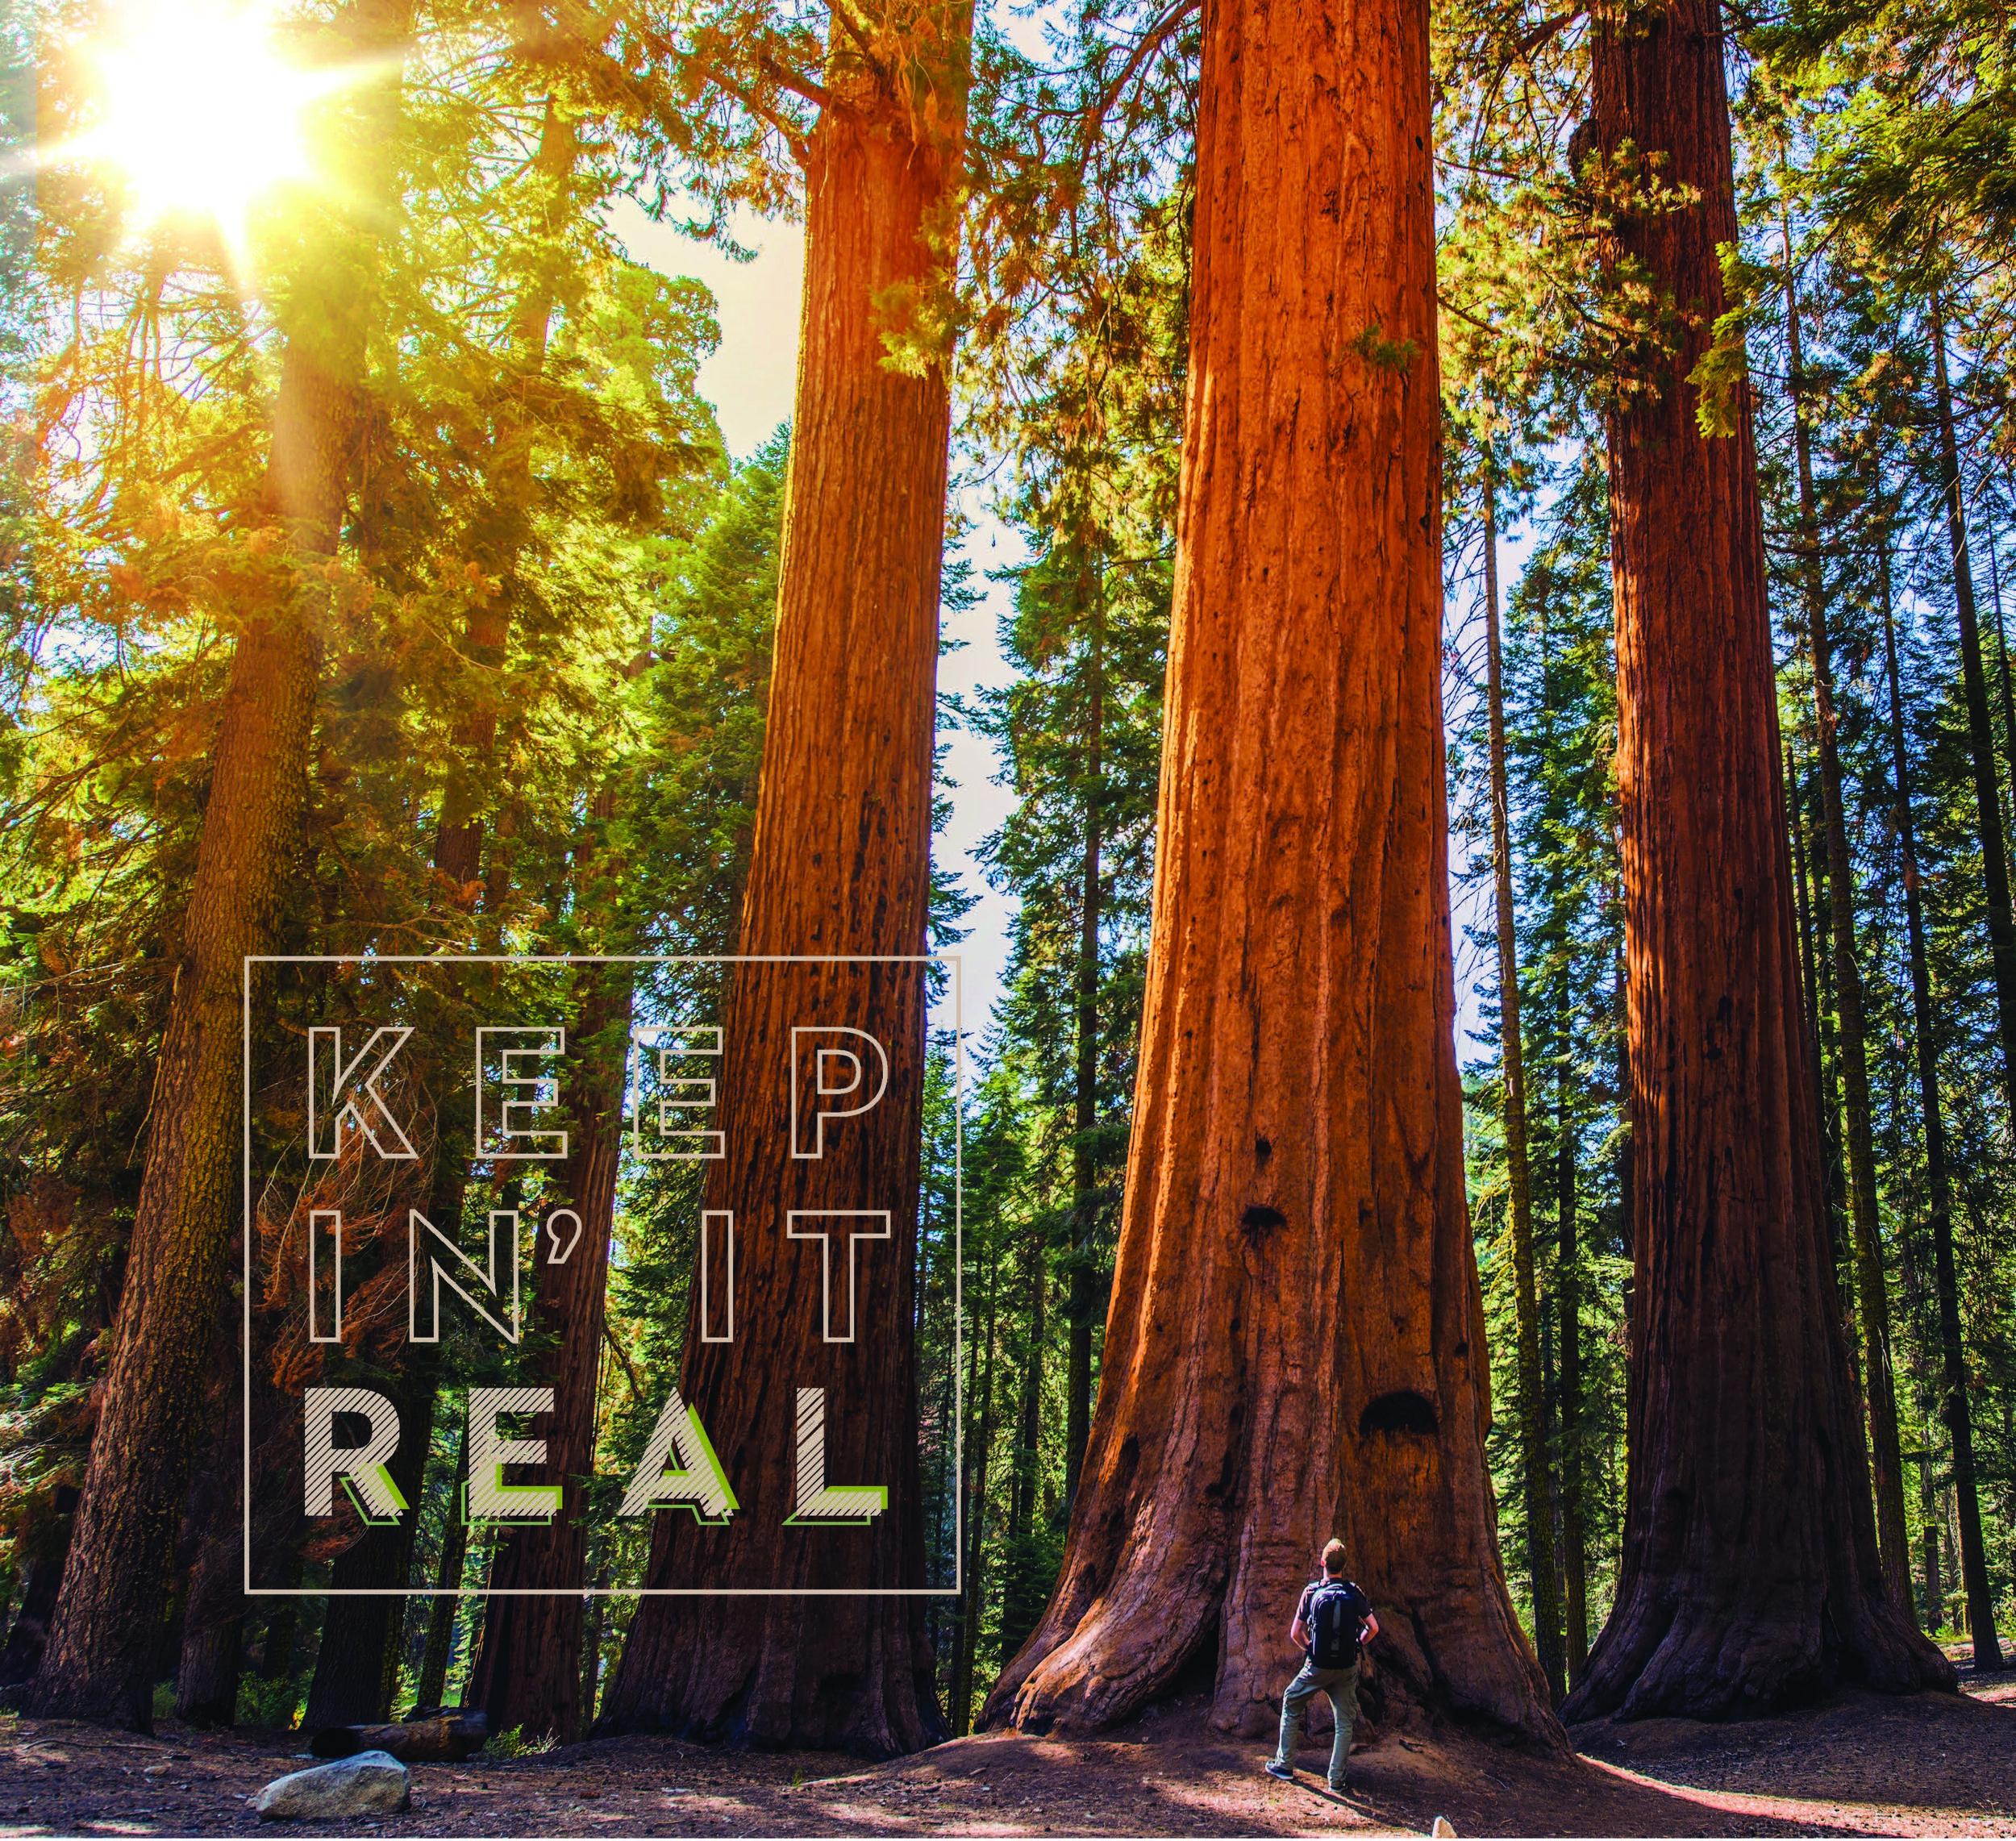 KeepinItReal_Woods.jpg